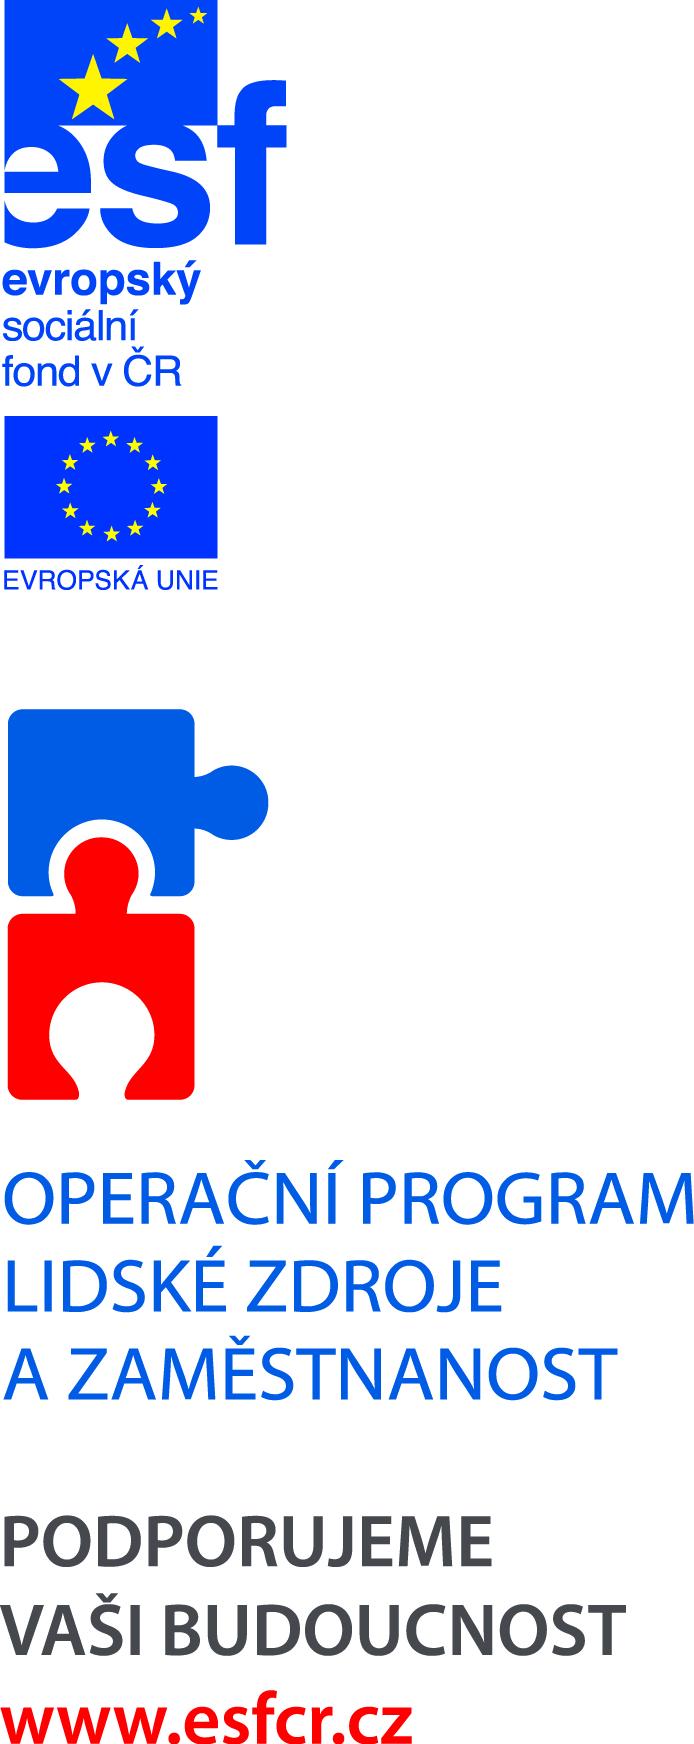 esf_eu_oplzz_podporujeme_vertikal_cmyk.jpg